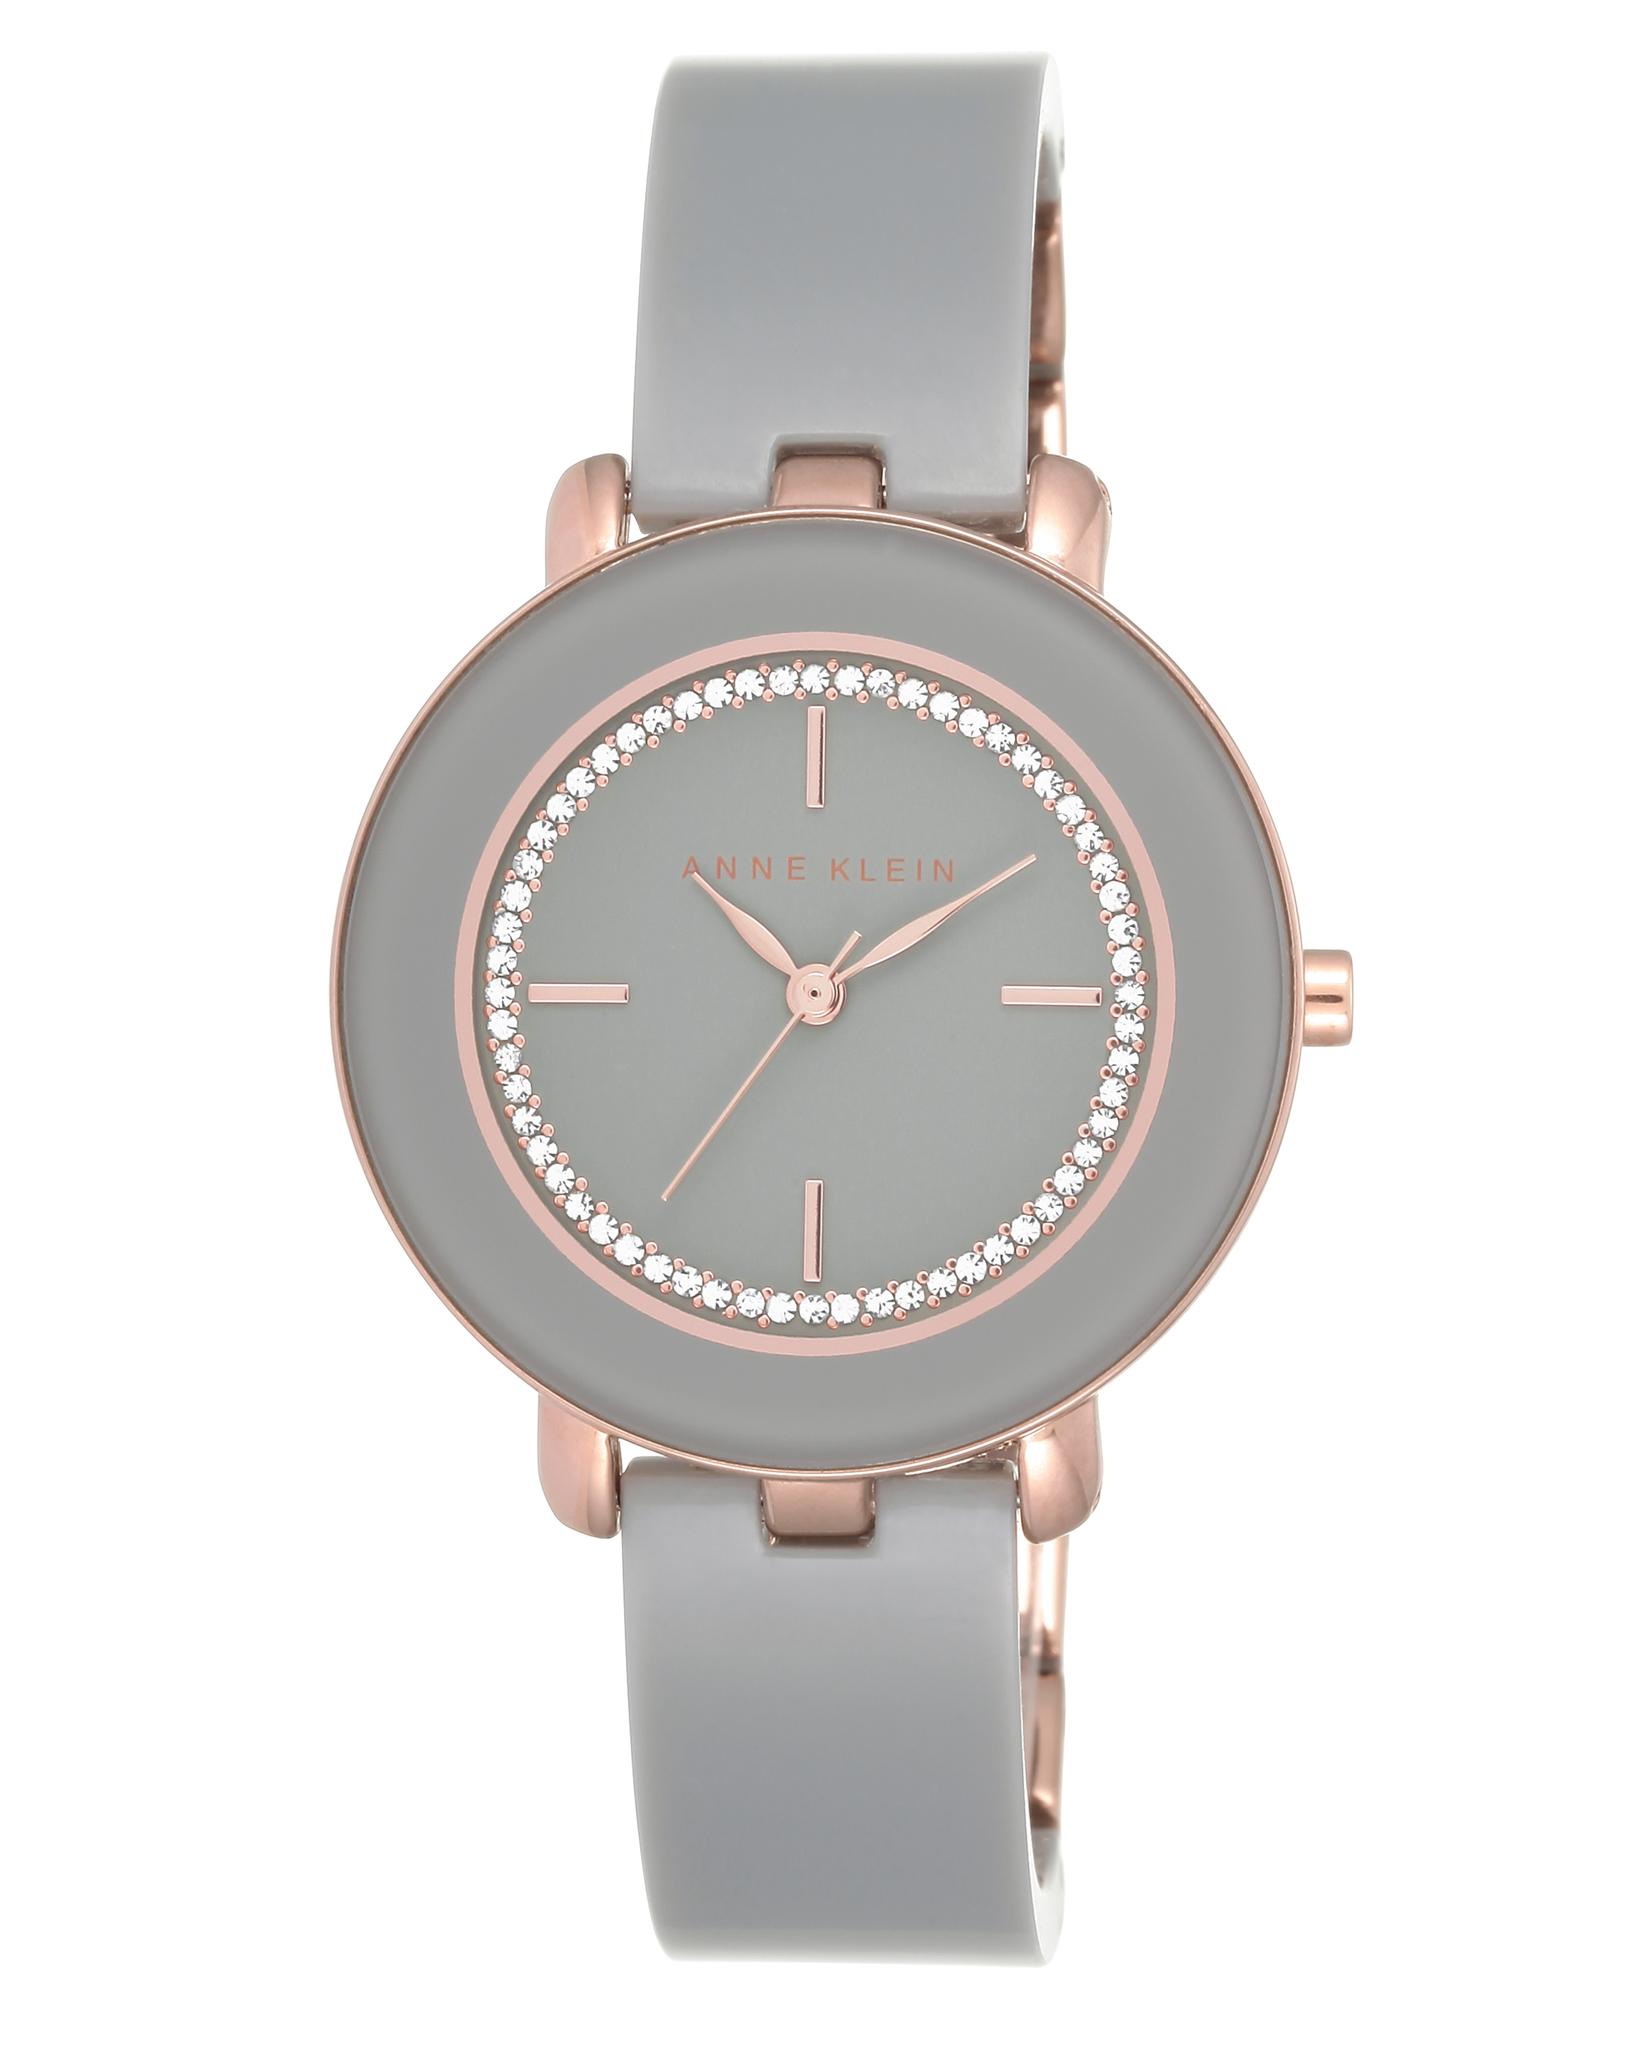 Anne Klein 1972RGGY - женские наручные часы из коллекции Big BangAnne Klein<br><br><br>Бренд: Anne Klein<br>Модель: Anne Klein 1972 RGGY<br>Артикул: 1972RGGY<br>Вариант артикула: None<br>Коллекция: Big Bang<br>Подколлекция: None<br>Страна: США<br>Пол: женские<br>Тип механизма: кварцевые<br>Механизм: None<br>Количество камней: None<br>Автоподзавод: None<br>Источник энергии: от батарейки<br>Срок службы элемента питания: None<br>Дисплей: стрелки<br>Цифры: отсутствуют<br>Водозащита: WR 30<br>Противоударные: None<br>Материал корпуса: не указан, частичное покрытие корпуса<br>Материал браслета: пластик<br>Материал безеля: None<br>Стекло: минеральное<br>Антибликовое покрытие: None<br>Цвет корпуса: None<br>Цвет браслета: None<br>Цвет циферблата: None<br>Цвет безеля: None<br>Размеры: 34 мм<br>Диаметр: None<br>Диаметр корпуса: None<br>Толщина: None<br>Ширина ремешка: None<br>Вес: None<br>Спорт-функции: None<br>Подсветка: None<br>Вставка: кристаллы Swarovski<br>Отображение даты: None<br>Хронограф: None<br>Таймер: None<br>Термометр: None<br>Хронометр: None<br>GPS: None<br>Радиосинхронизация: None<br>Барометр: None<br>Скелетон: None<br>Дополнительная информация: пластиковый безель<br>Дополнительные функции: None